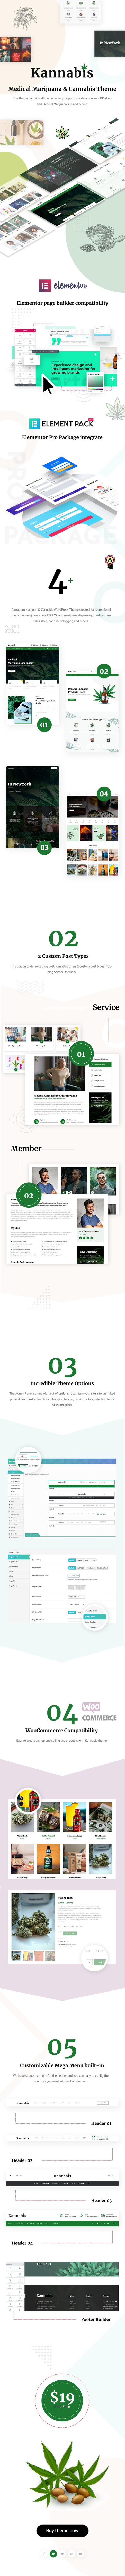 Kannabis - Medizinisches Marihuana & Cannabis WordPress Theme - 1